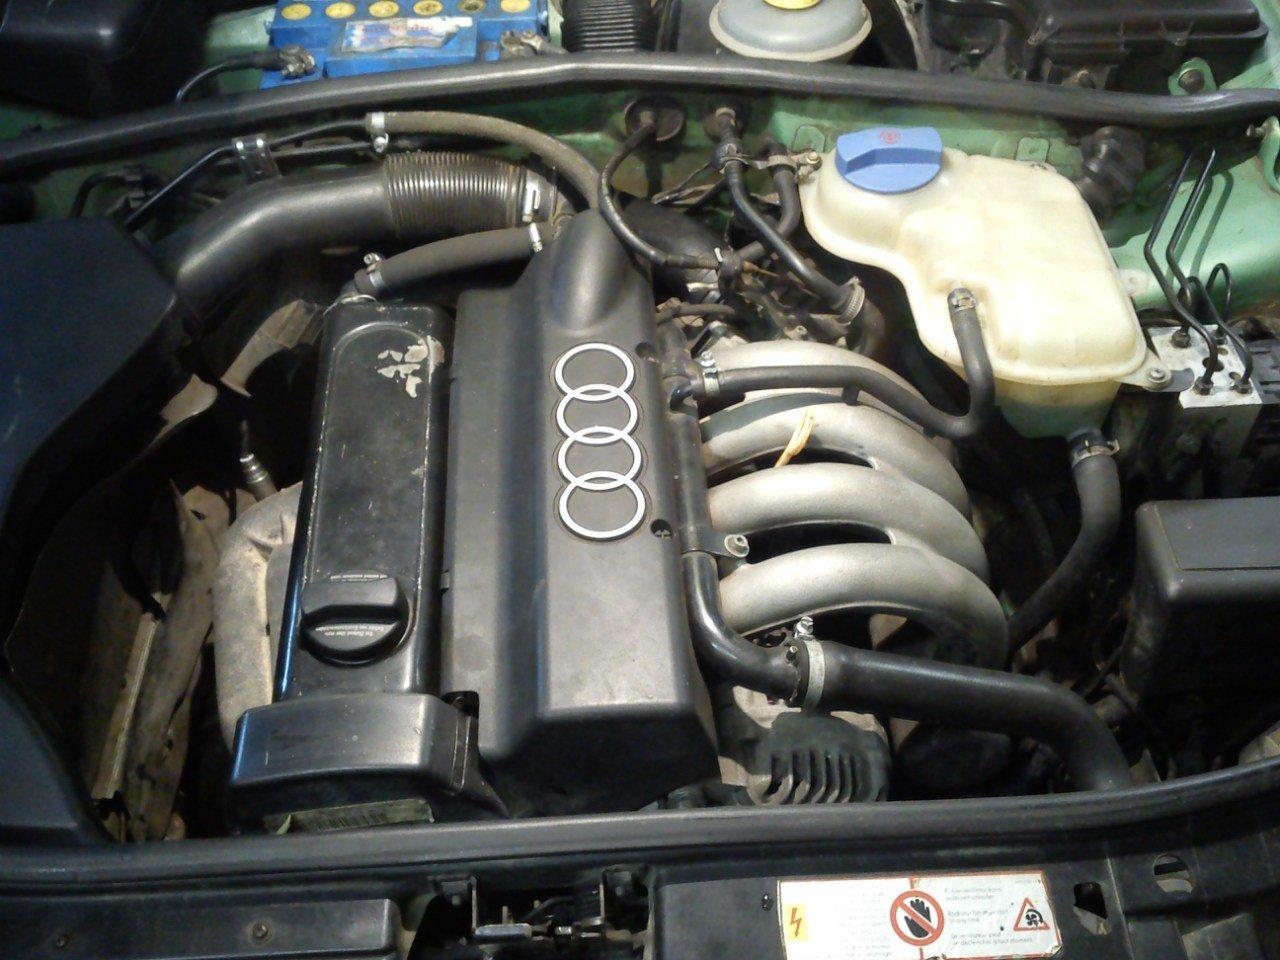 Замена масла на Ауди А4 своими руками в гаражных условиях Фото инструкция по замене масла в двигателе Audi A4